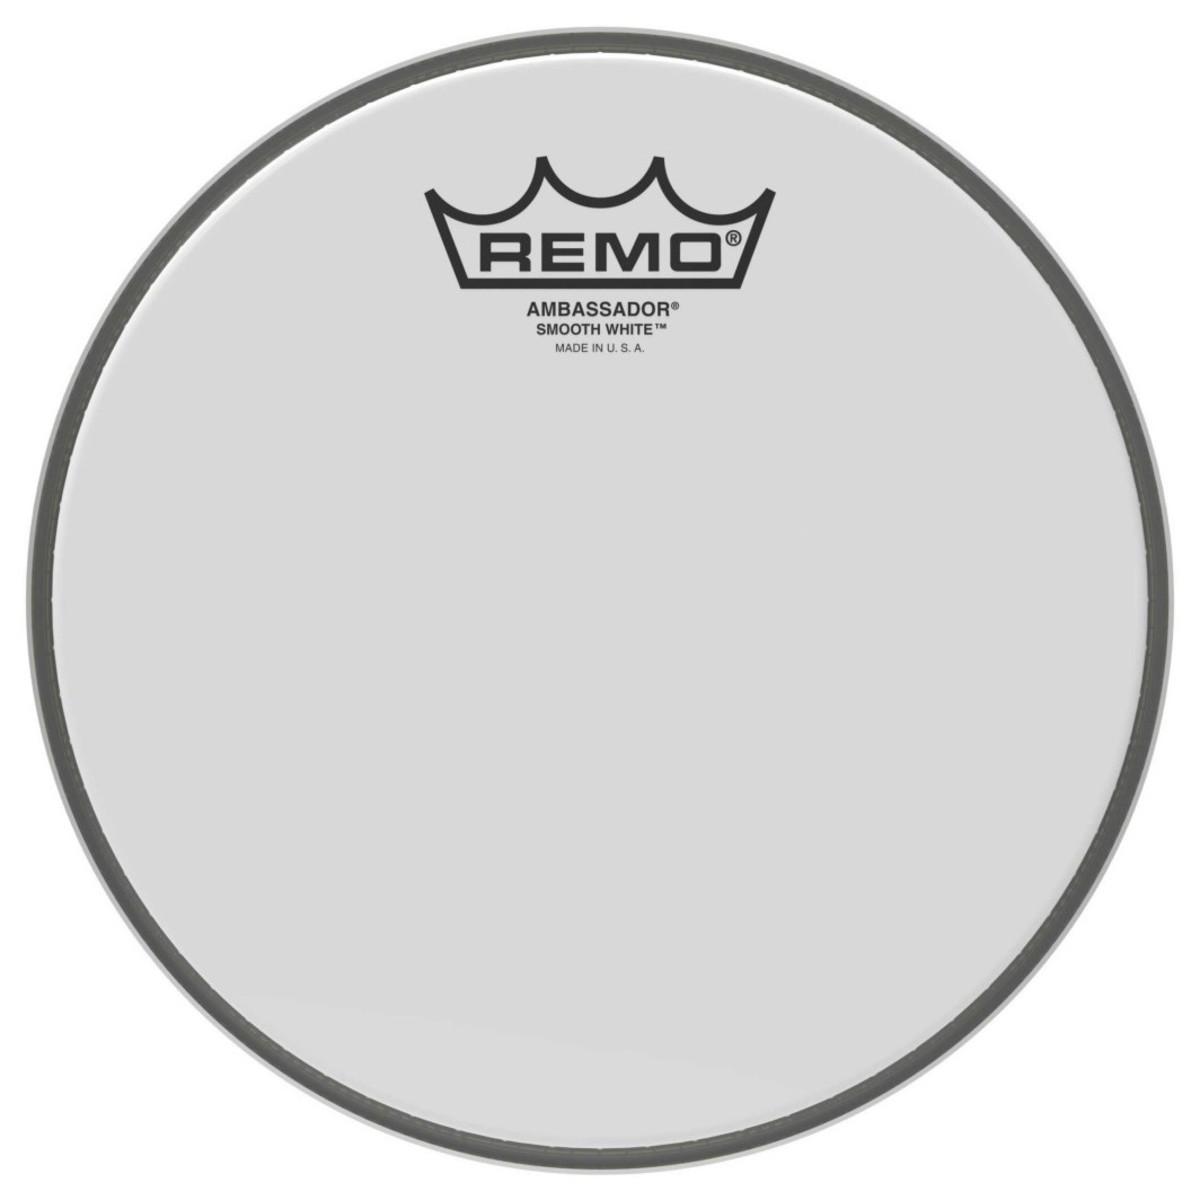 Remo Ambassador Smooth White 10 Drum Head